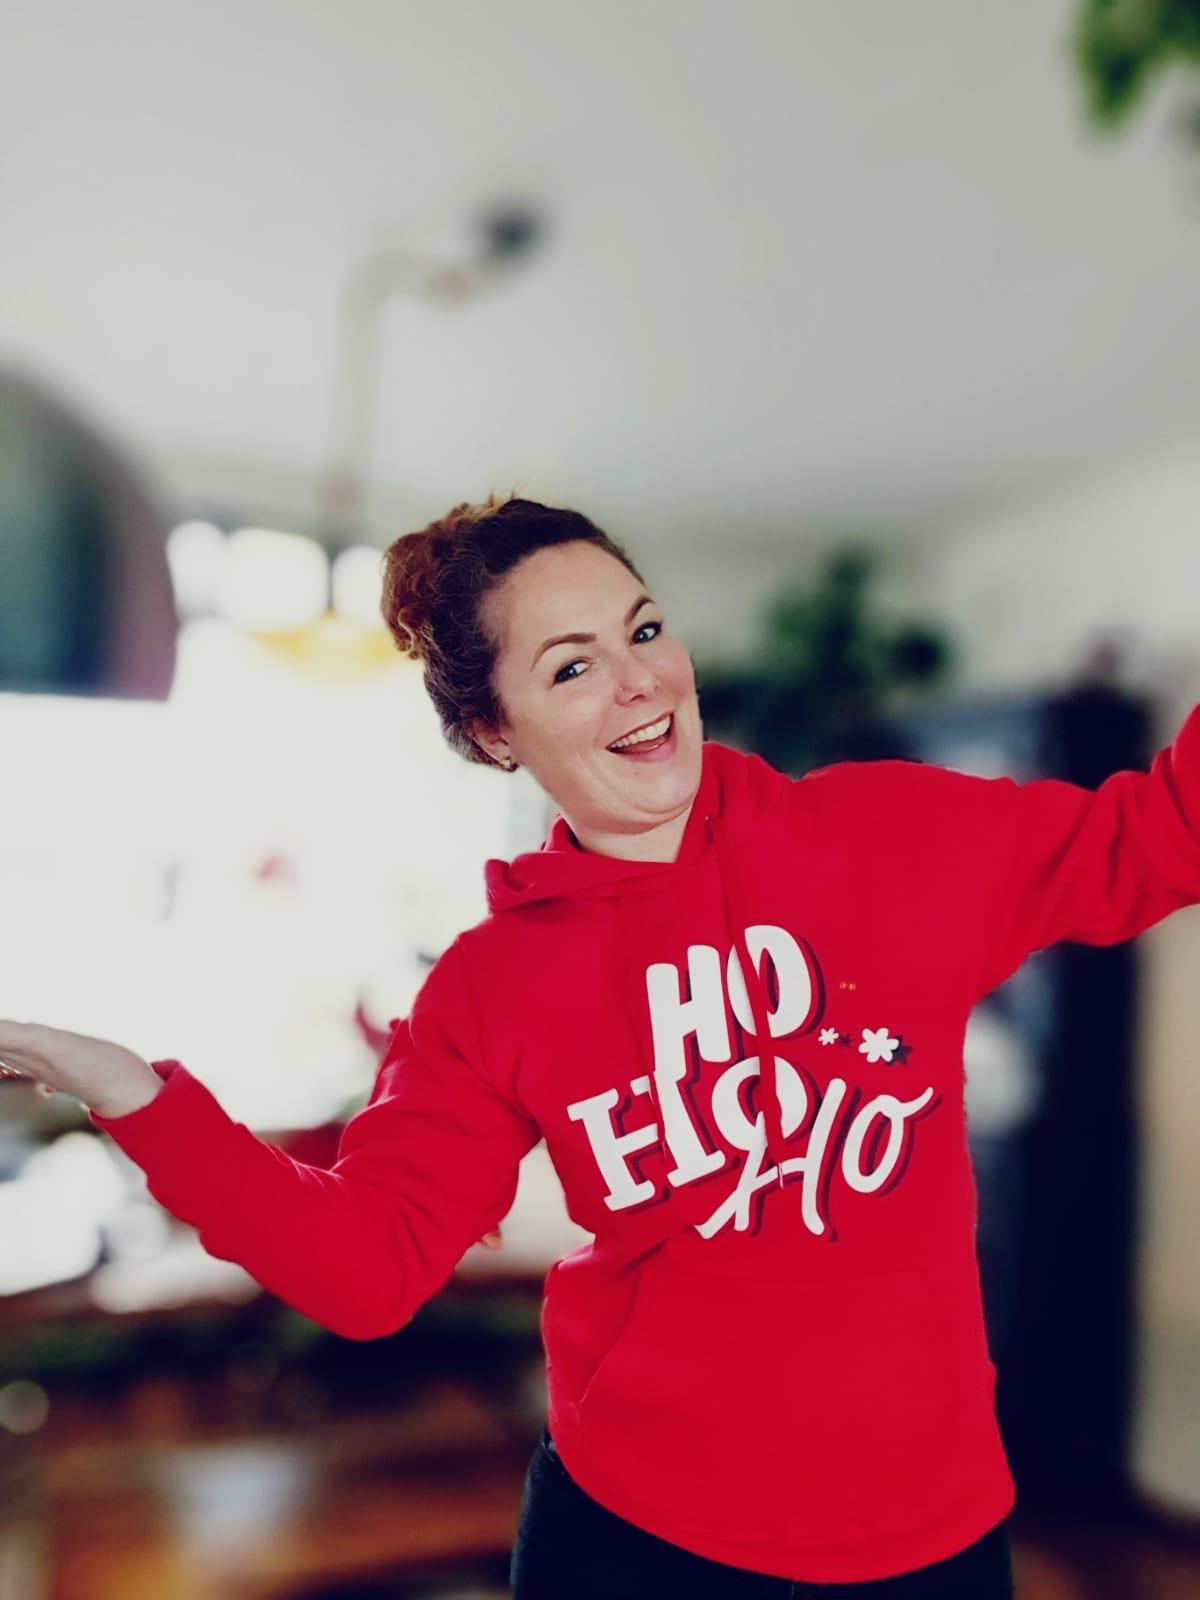 Gee sweatshirt hoody rood tekst gewonnen drukwerkdeal